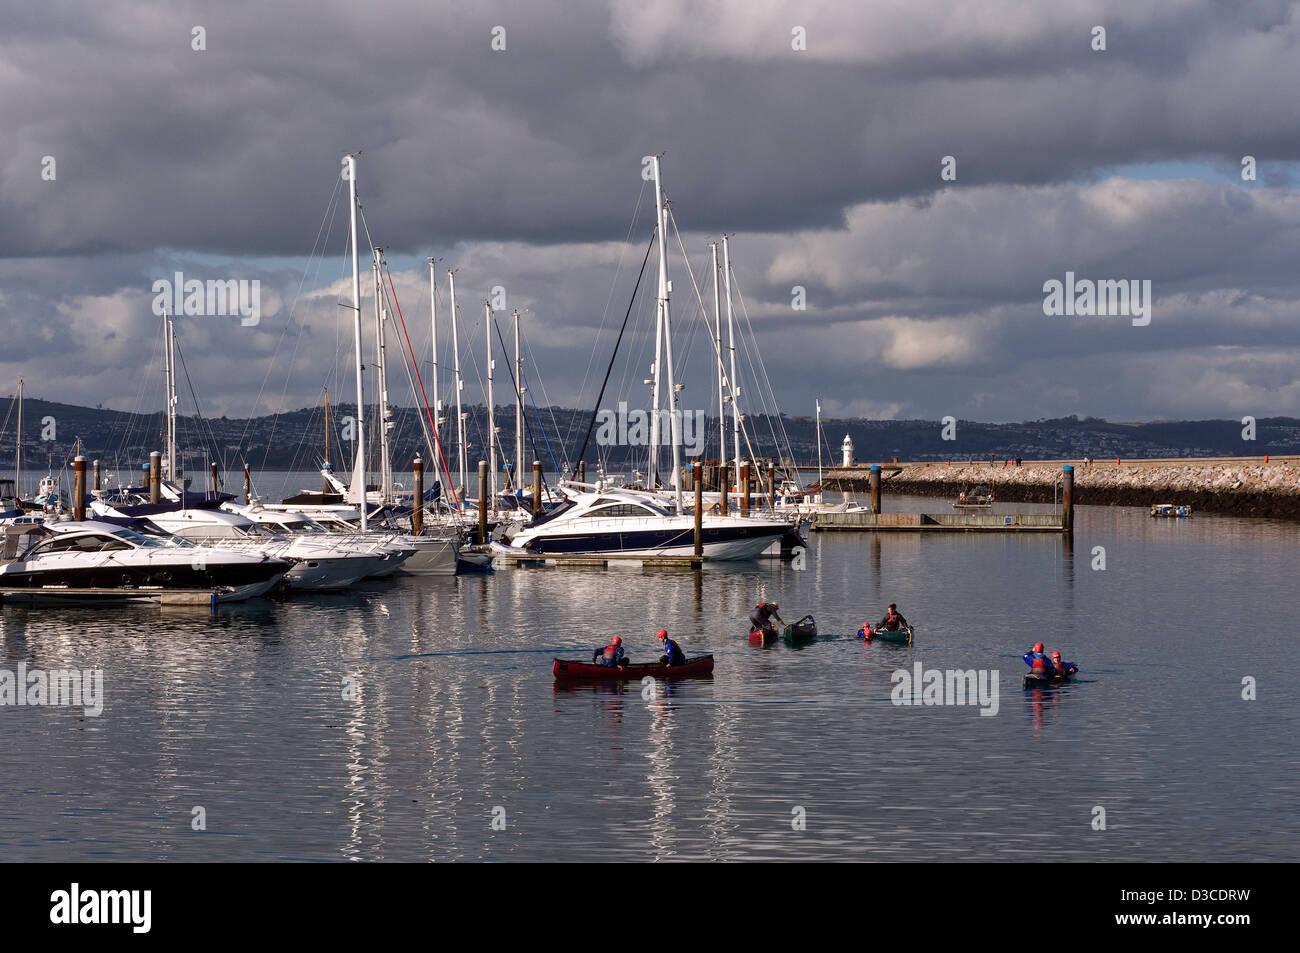 Brixham marina,Breakwater,Brixham Harbour, anchored, blue, boat, bow, choppy, docked, fluid, green, launch,  Fish - Stock Image